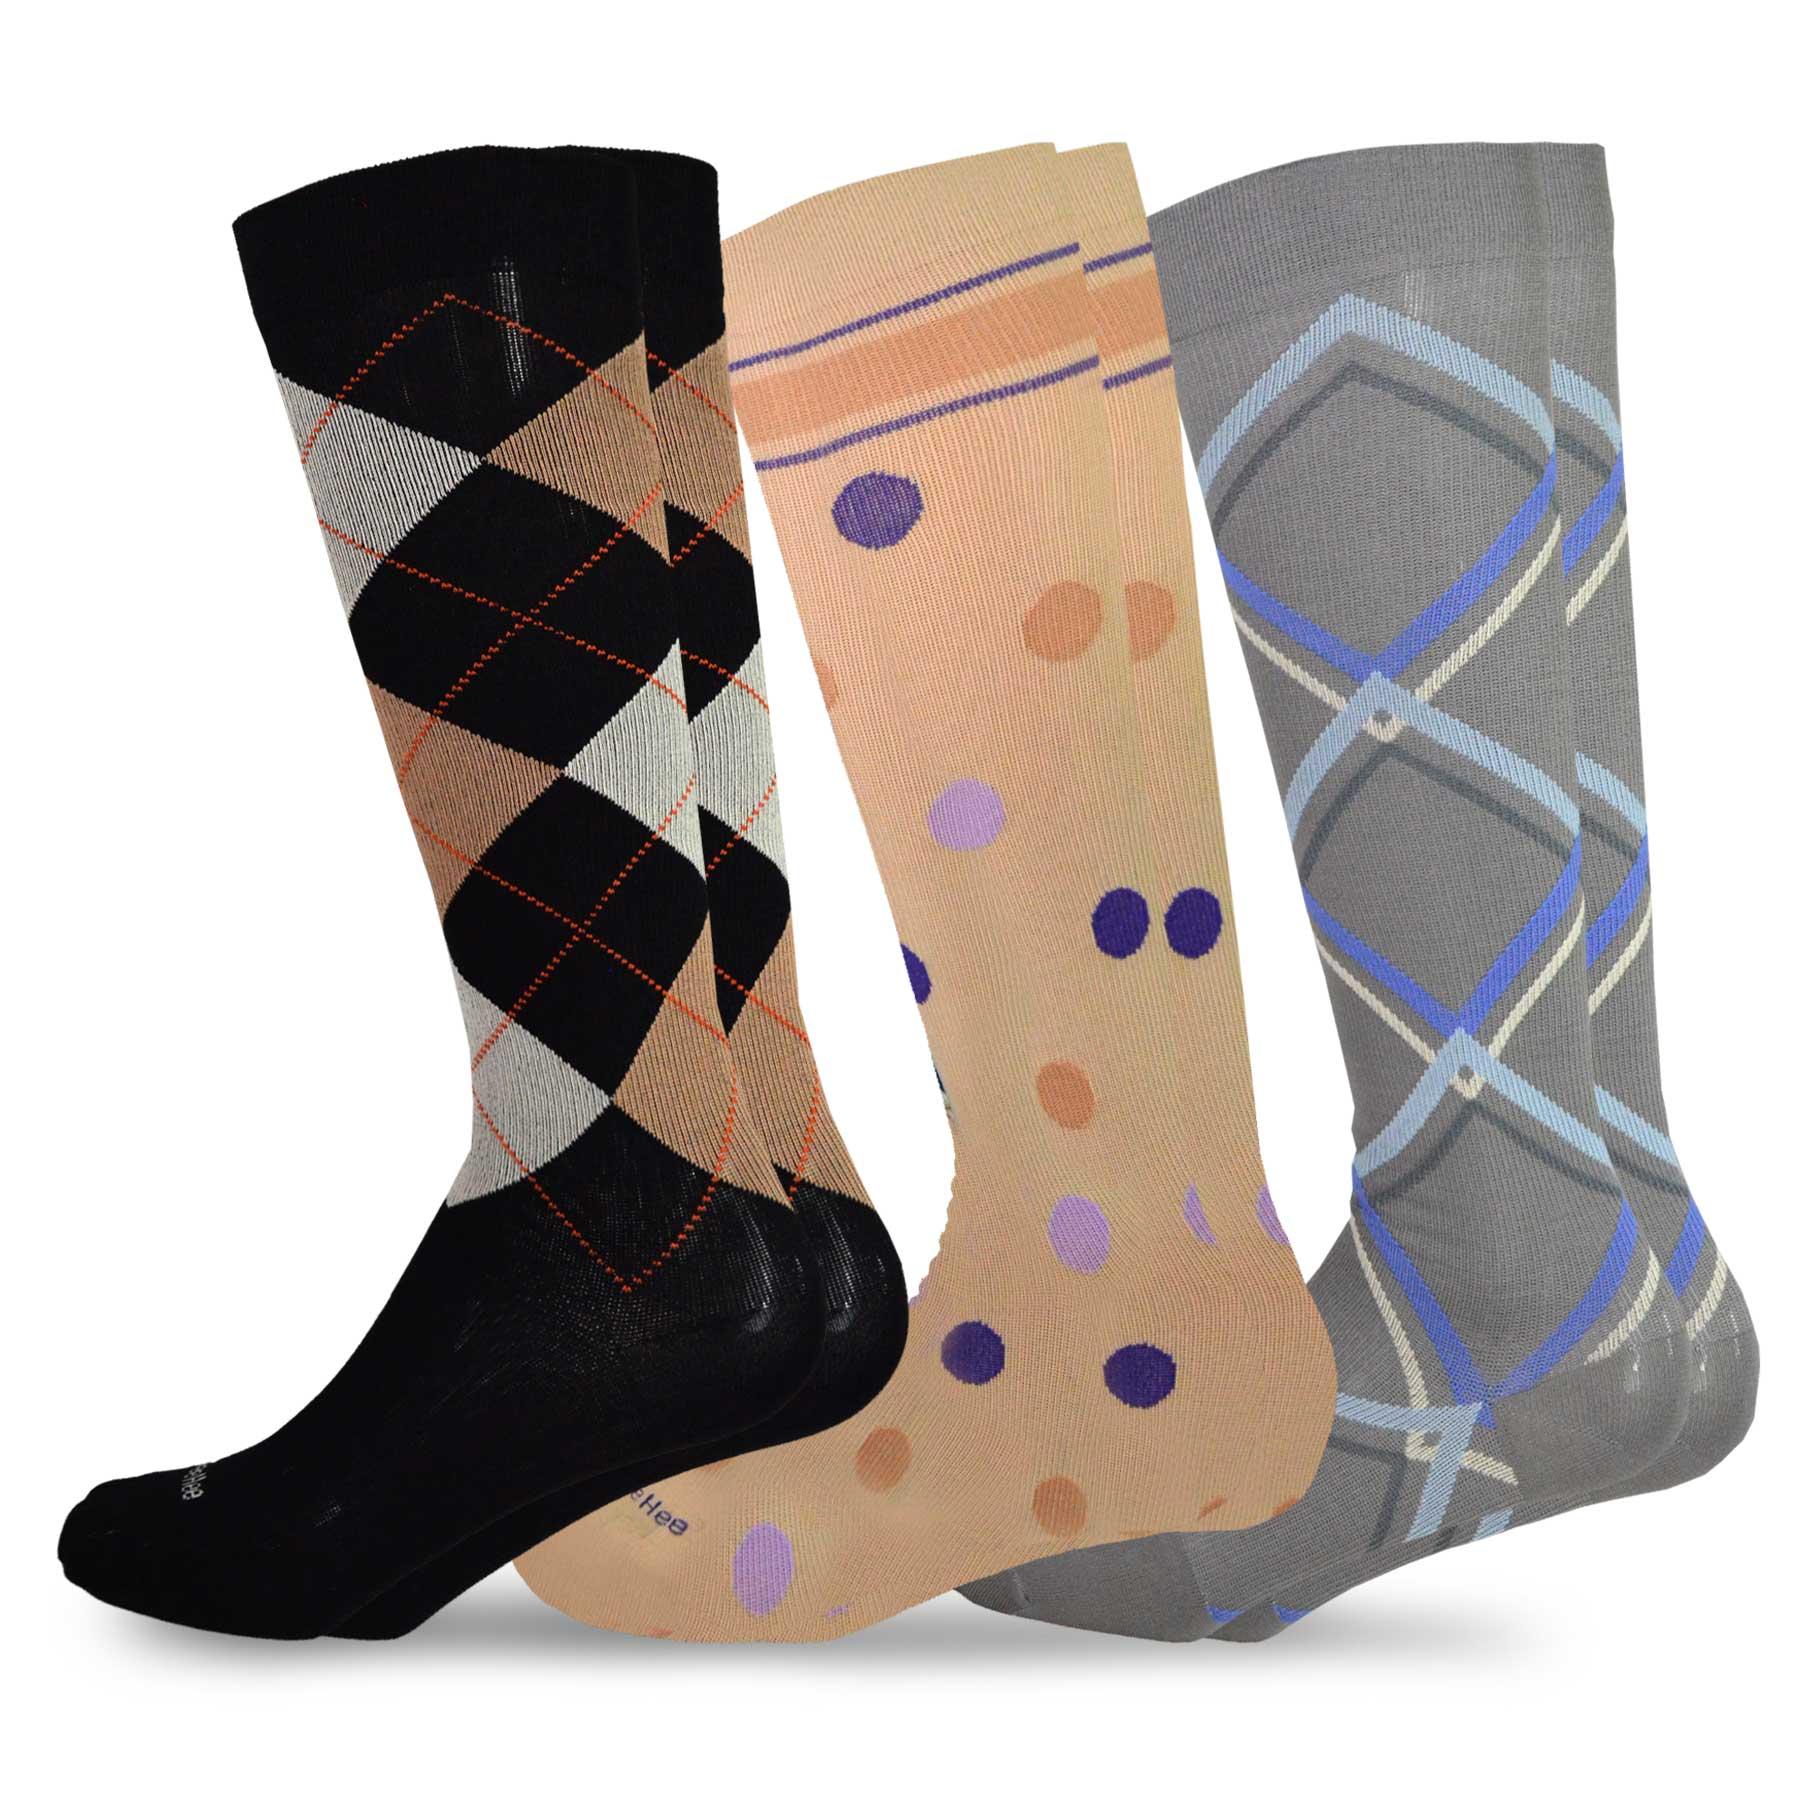 2dc0ef2921 TeeHee Microfiber Compression Knee High Socks with Rib 3-Pack ...